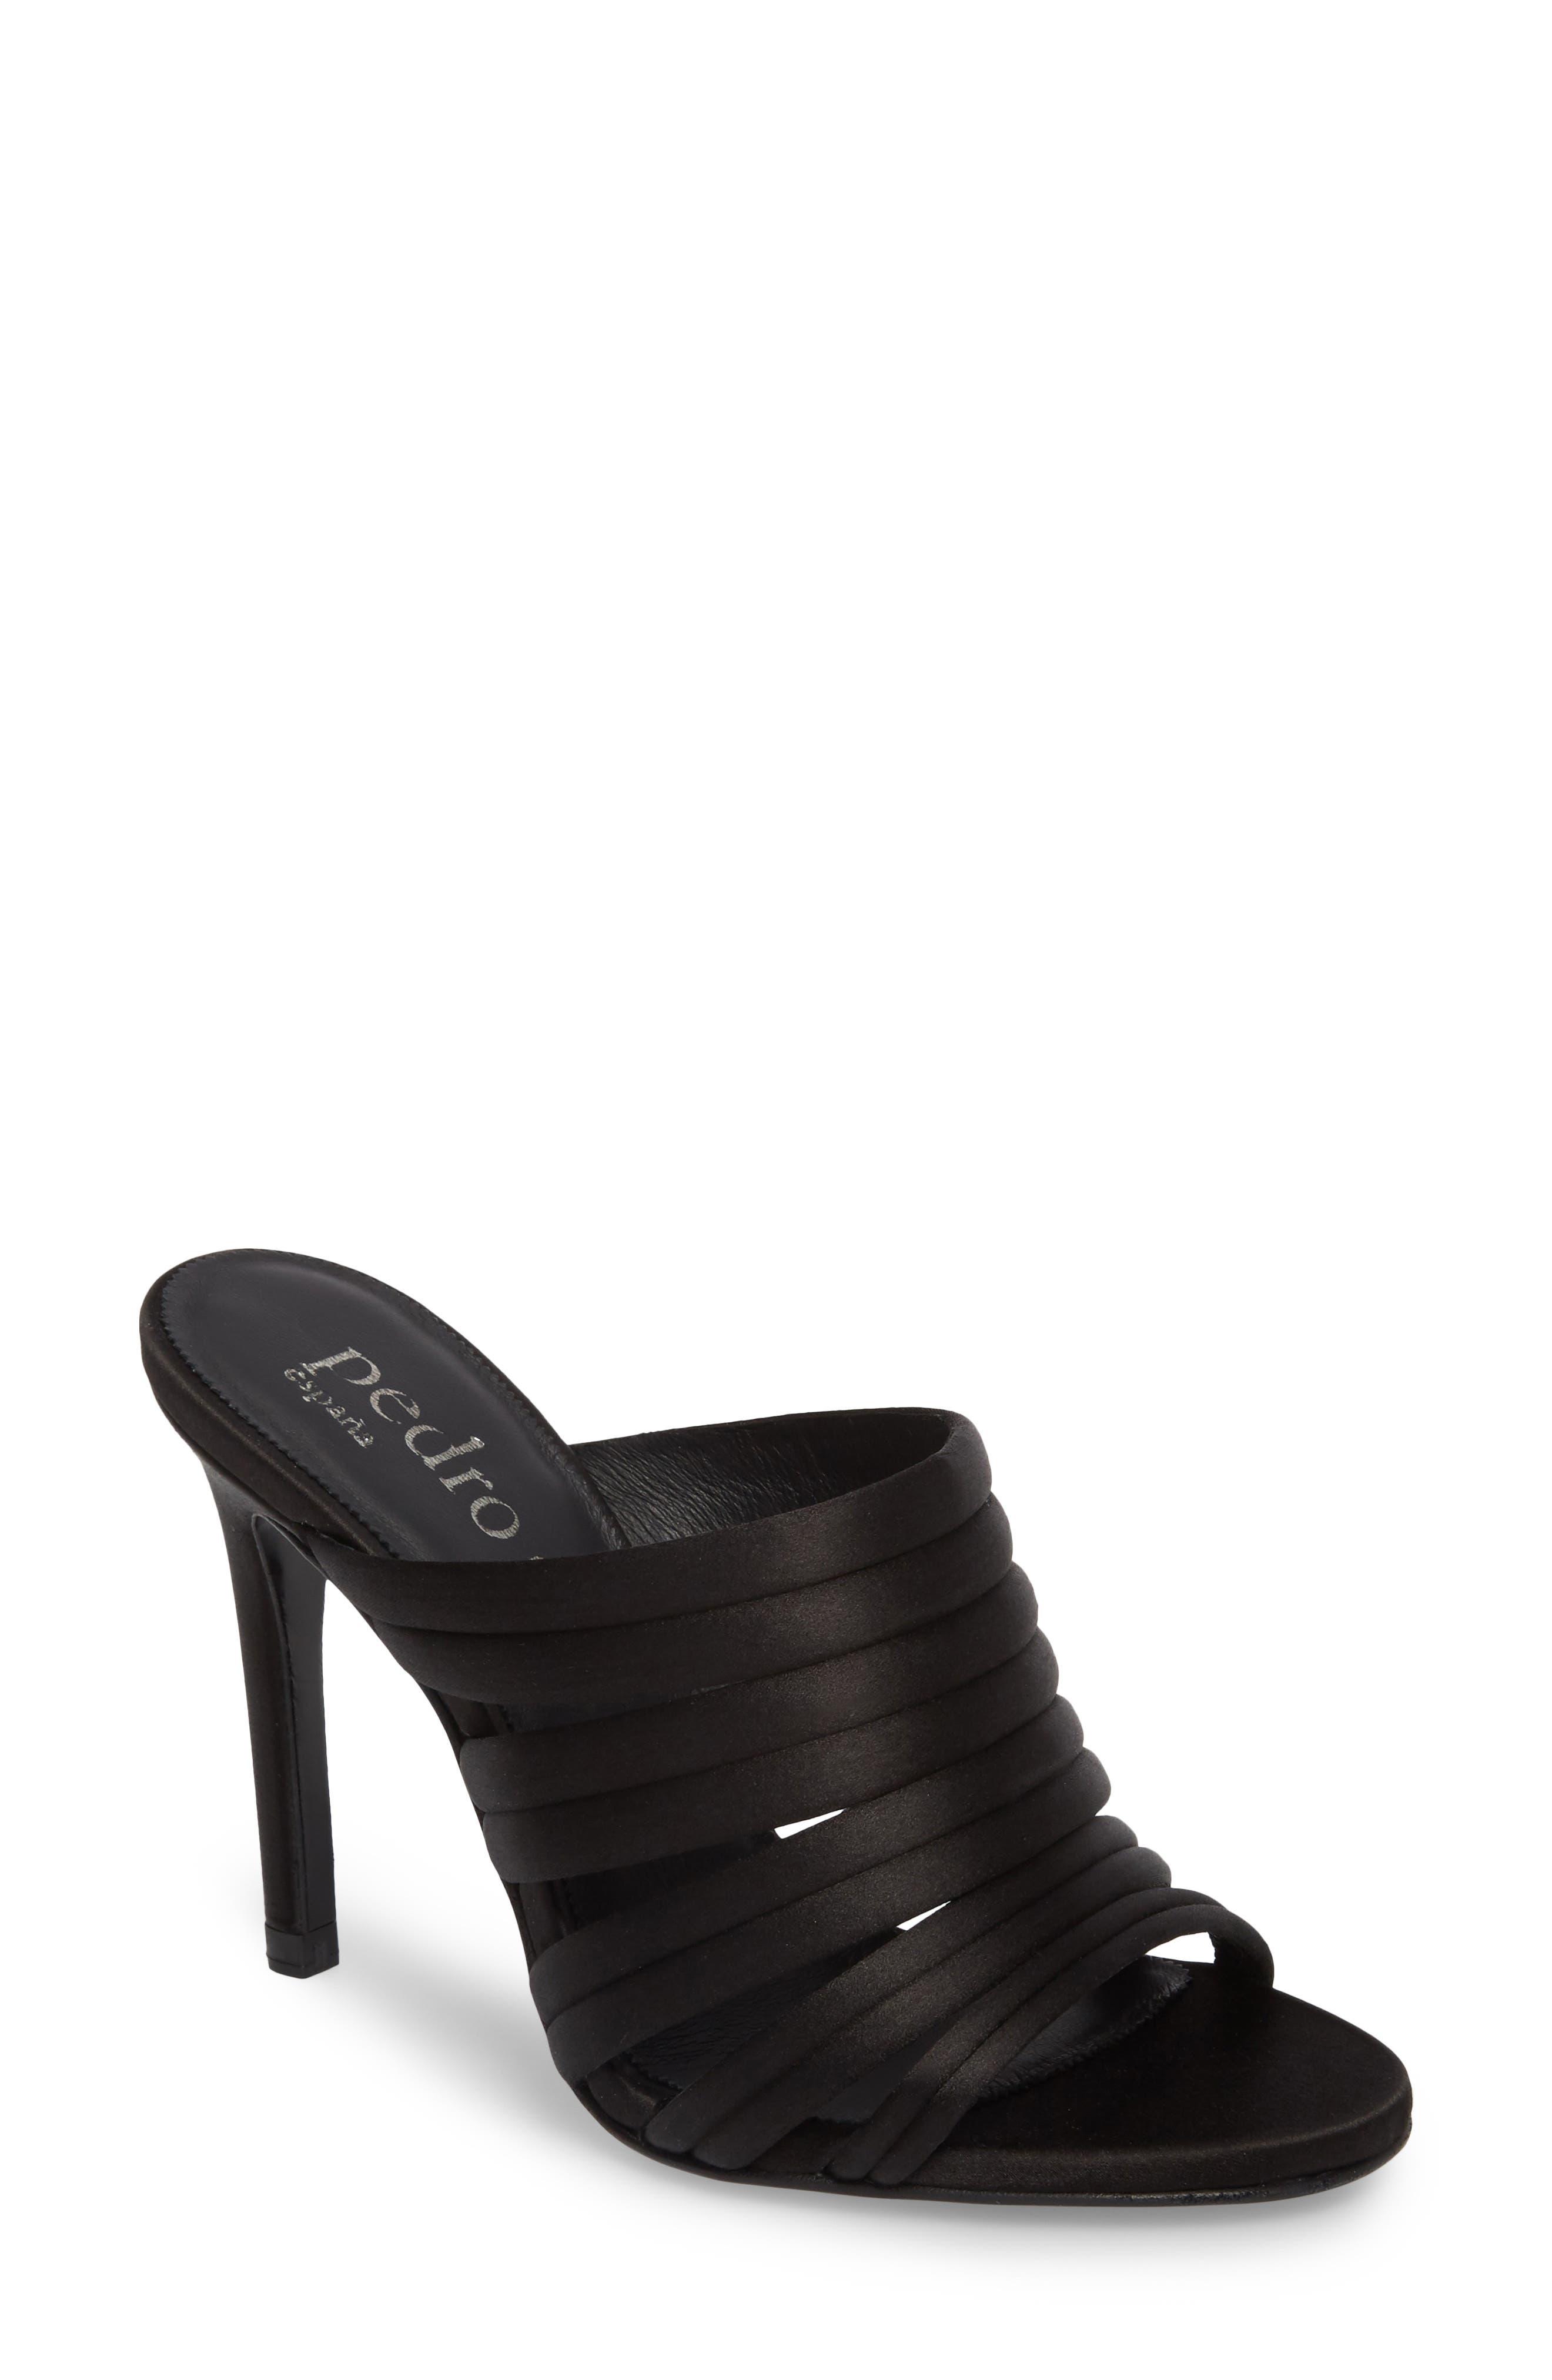 Caley Slide Sandal,                         Main,                         color,